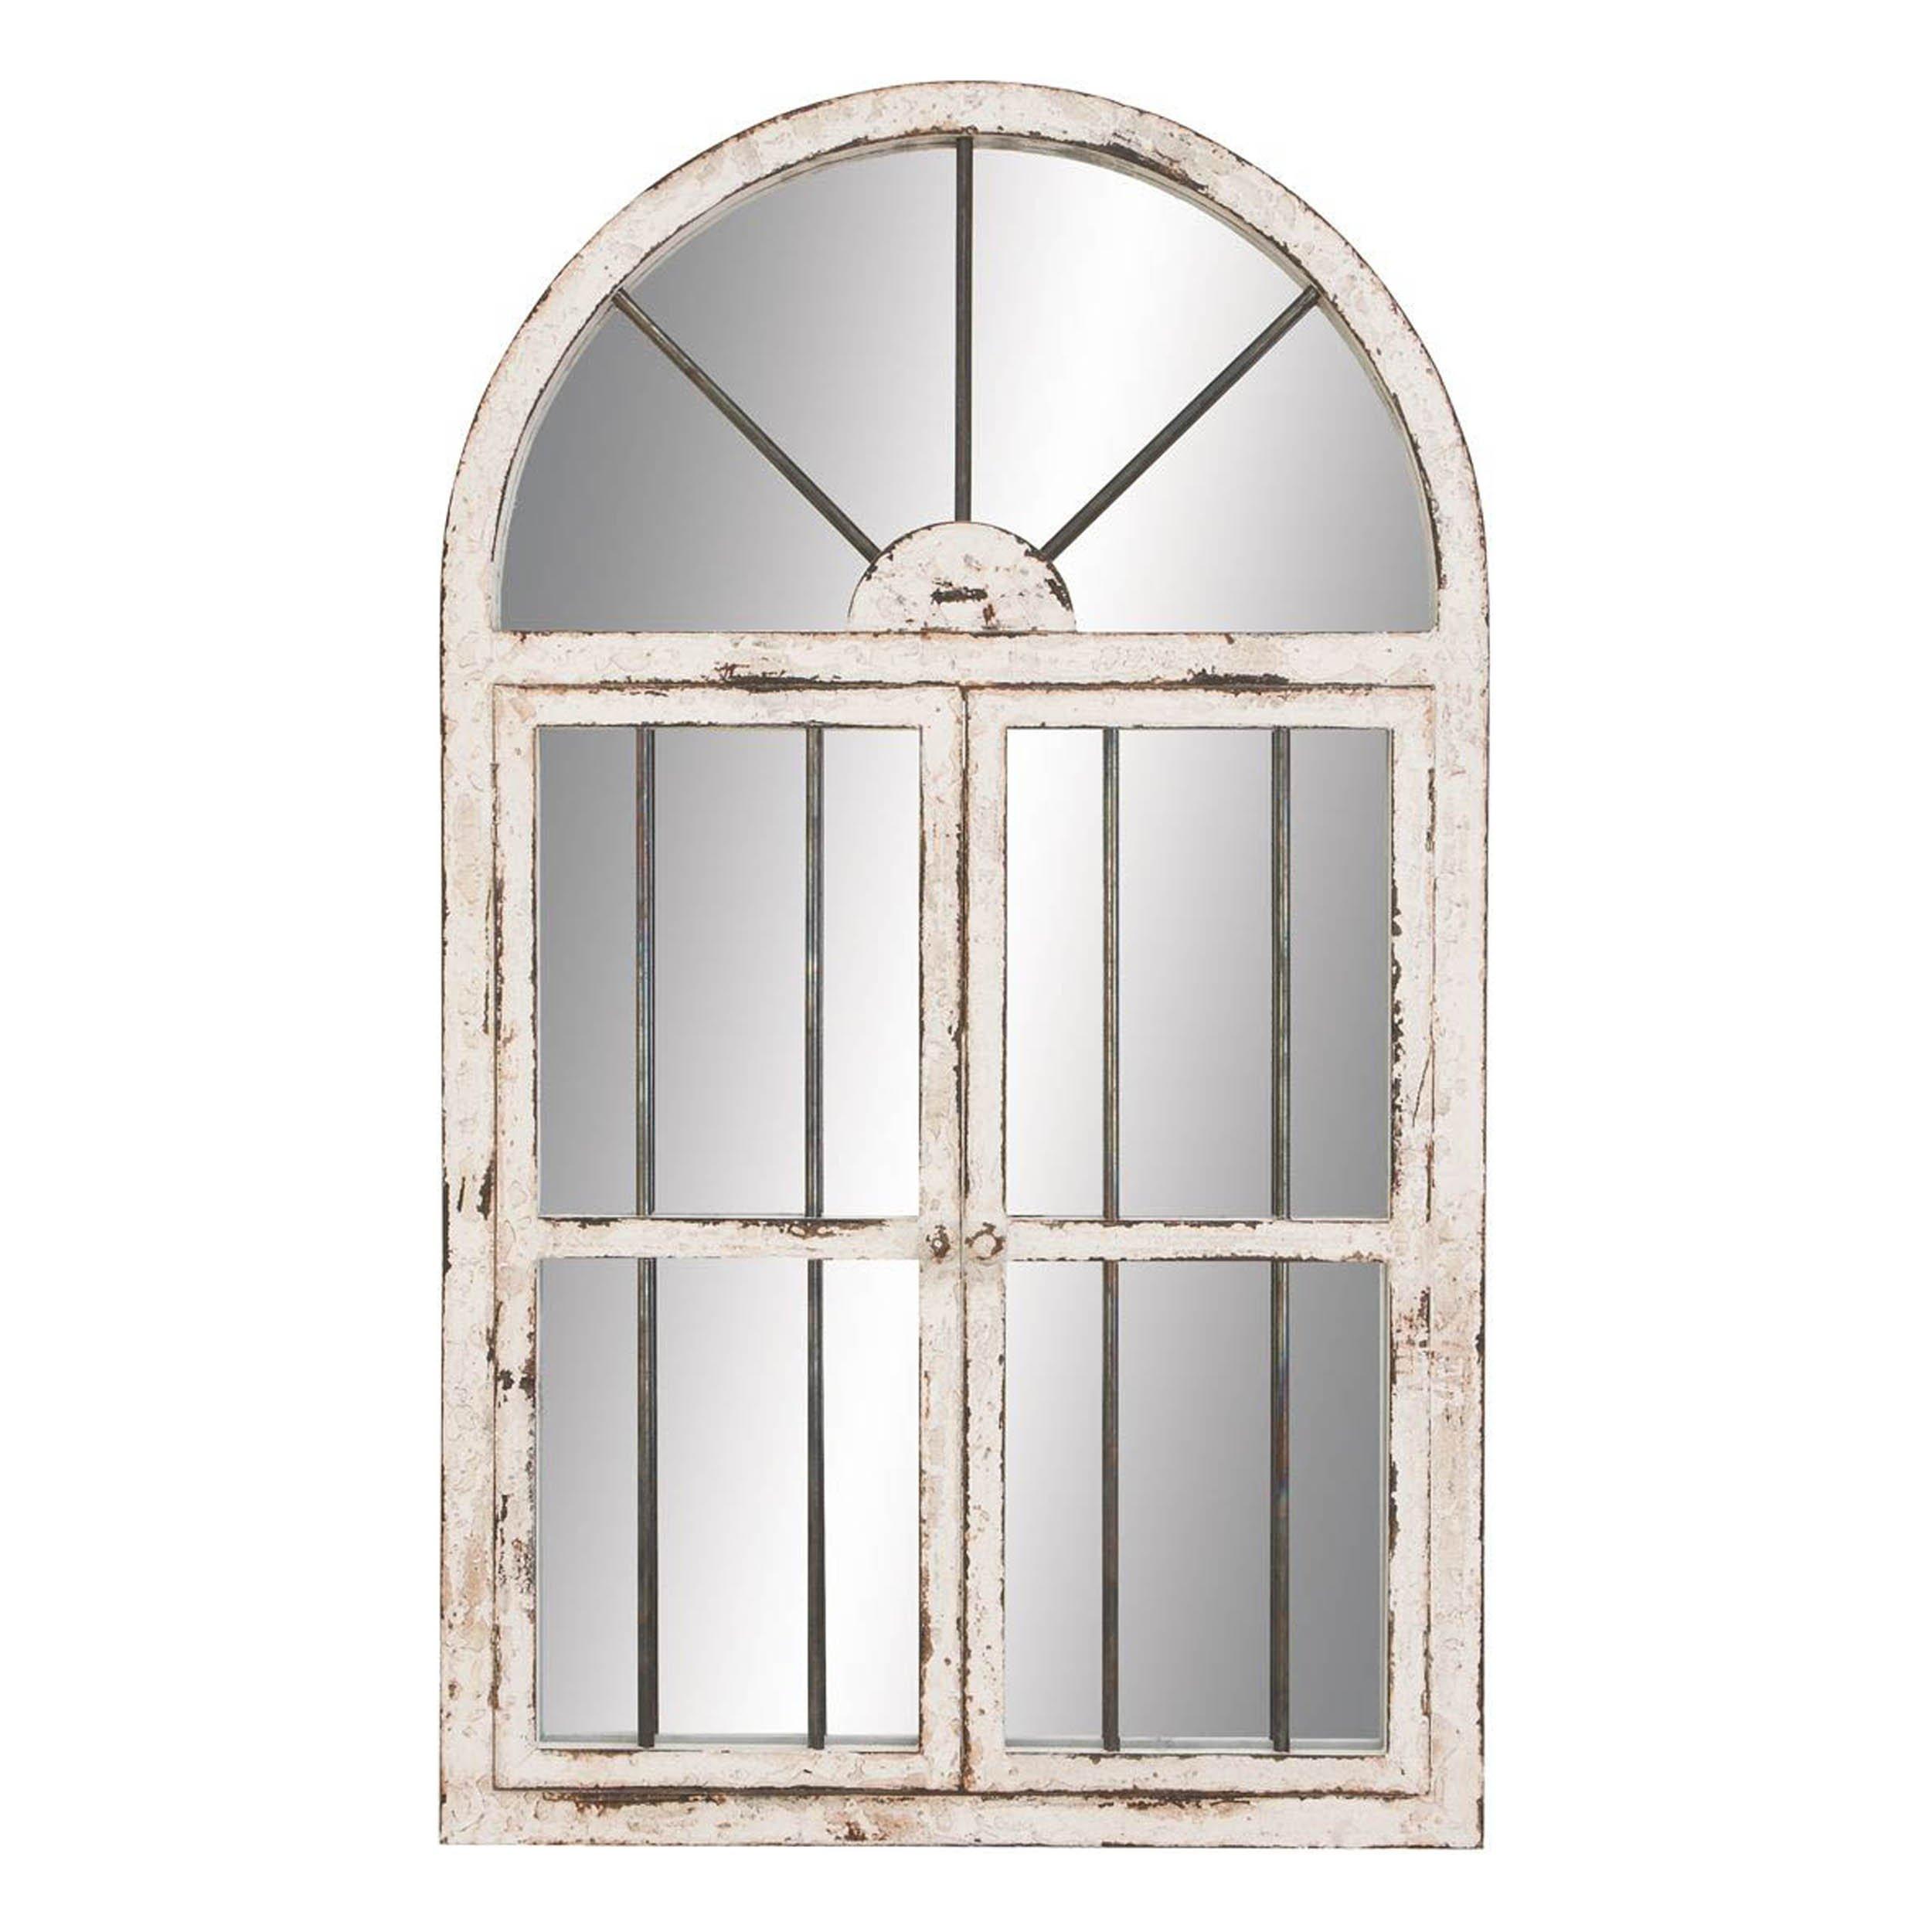 Deco 79 74397 Wood Window Mirror 42''H, 25''W -